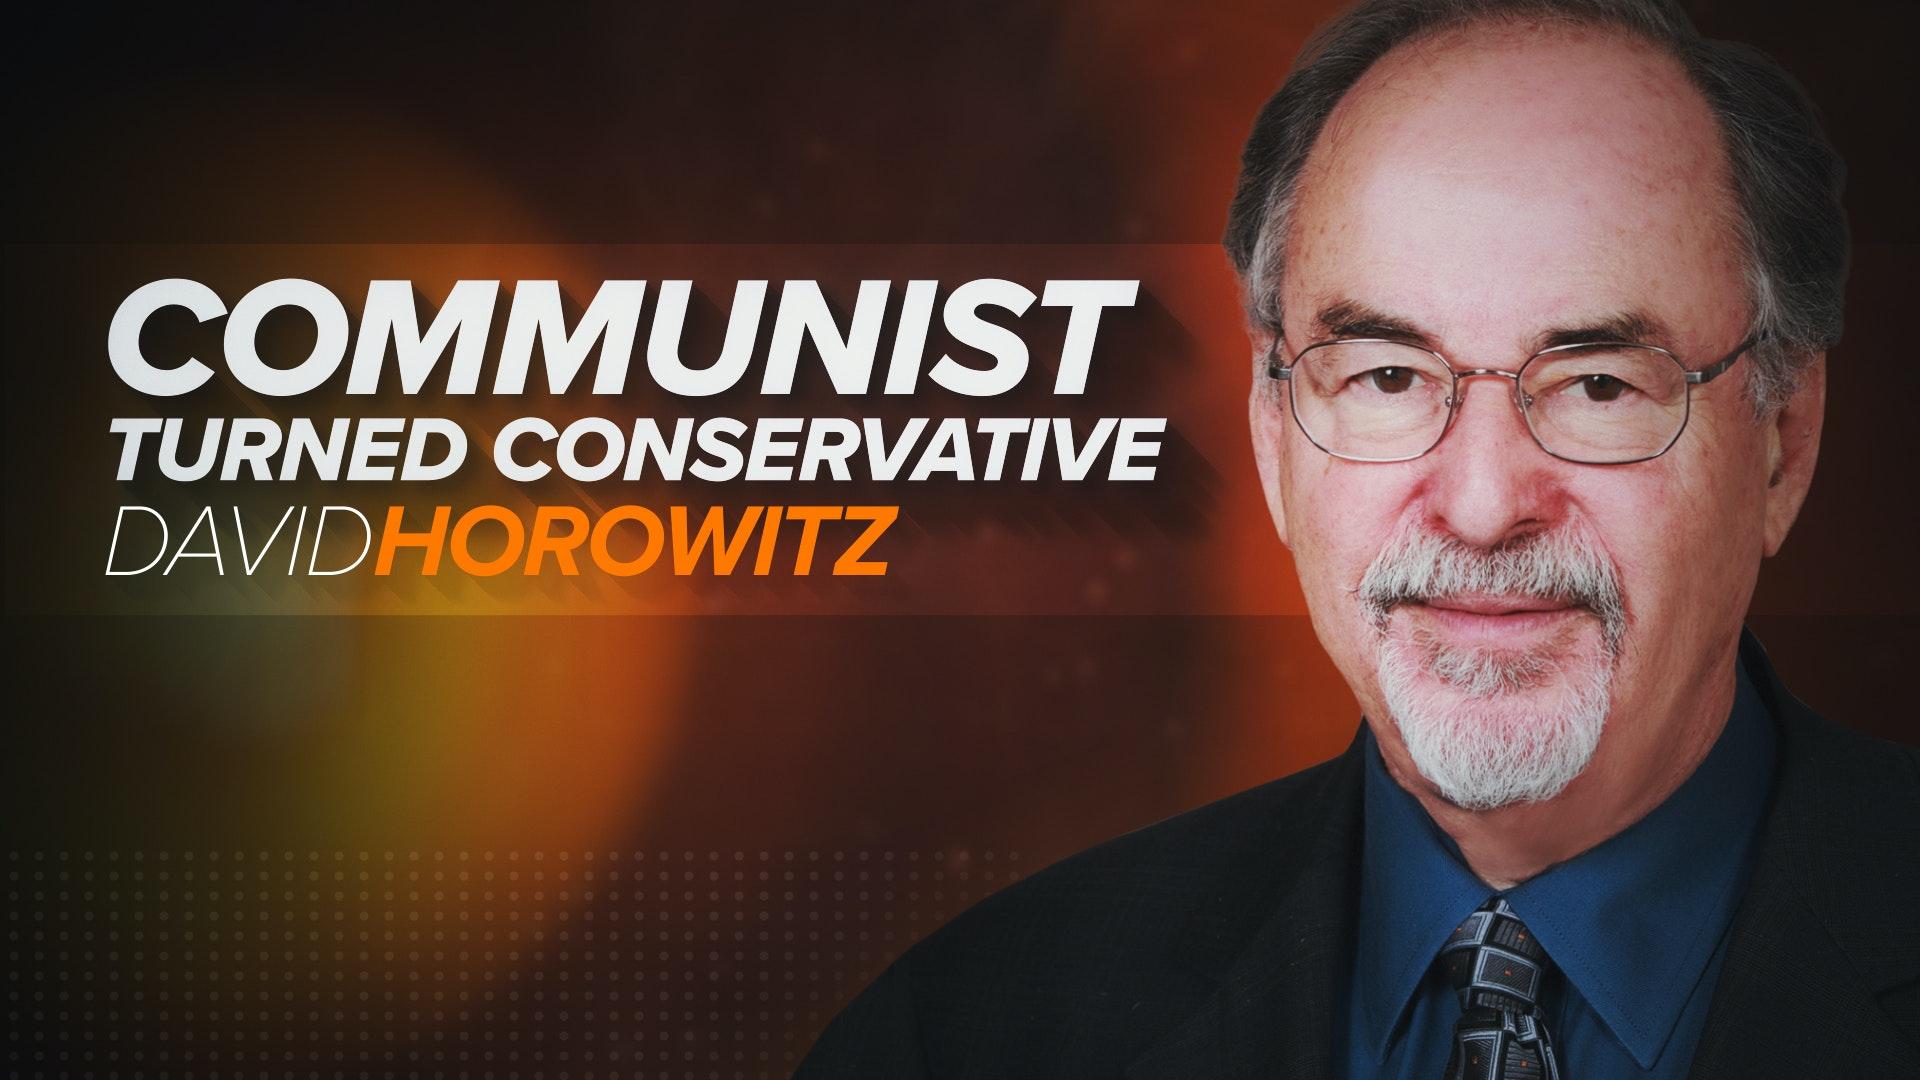 Ep. 115 - David Horowitz